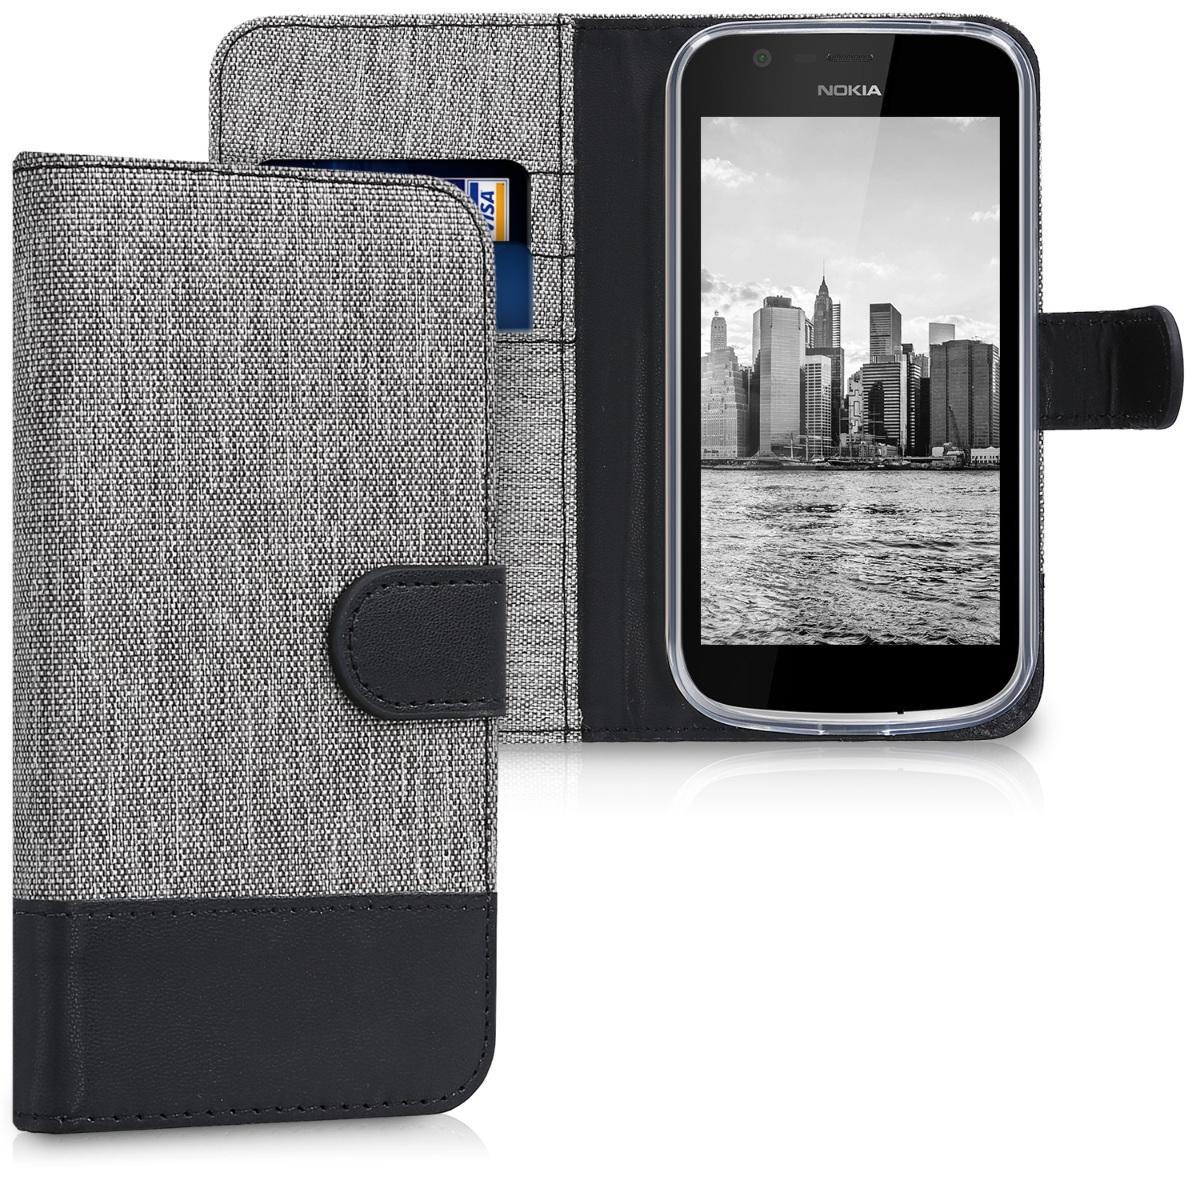 KW Θήκη Πορτοφόλι Nokia 1 - Grey / Black (44503.01)